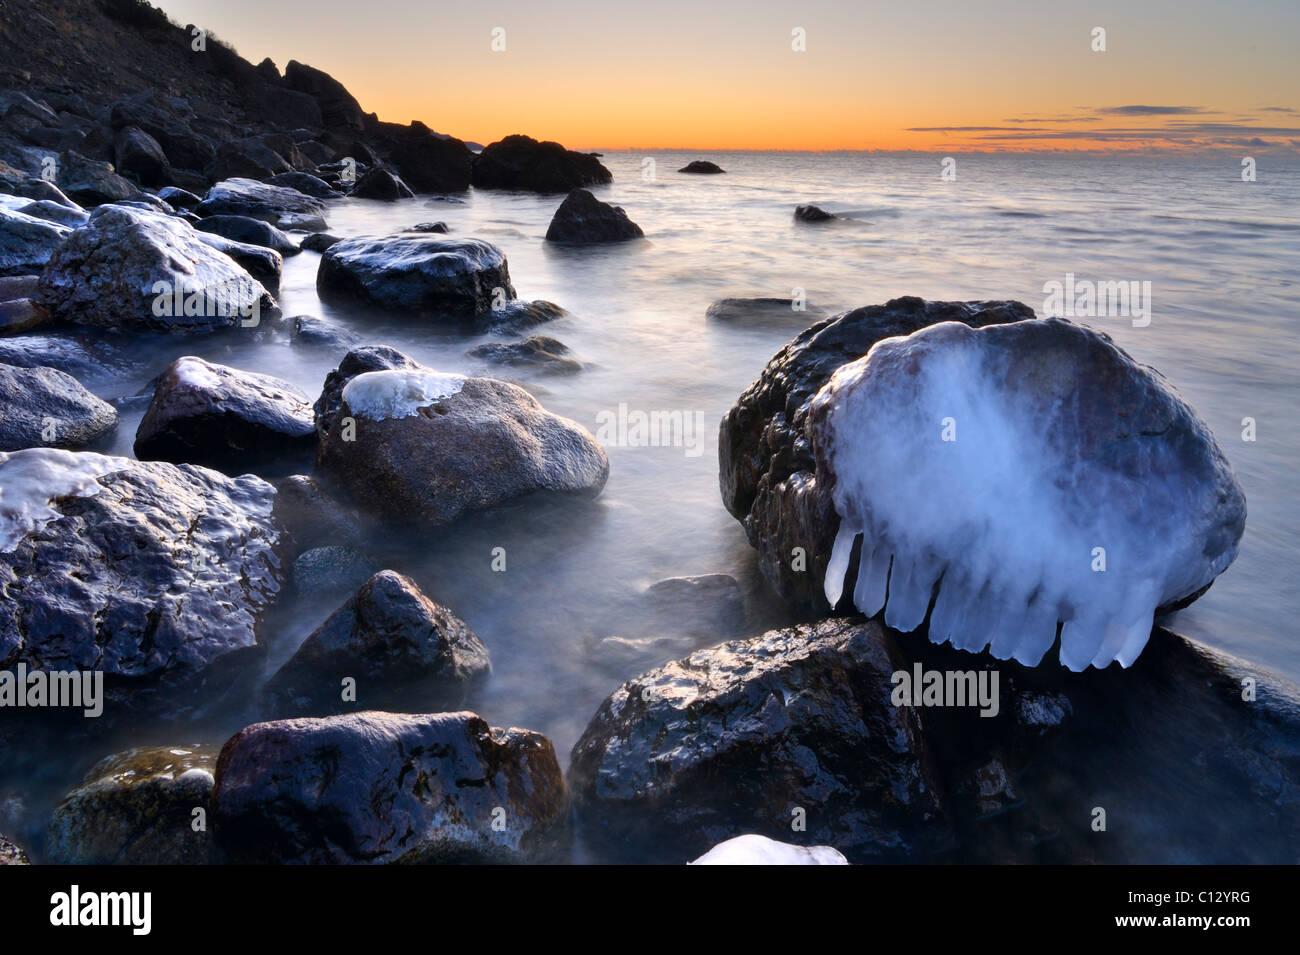 ice covered rocks on crimean black sea coast at robber bay - Stock Image